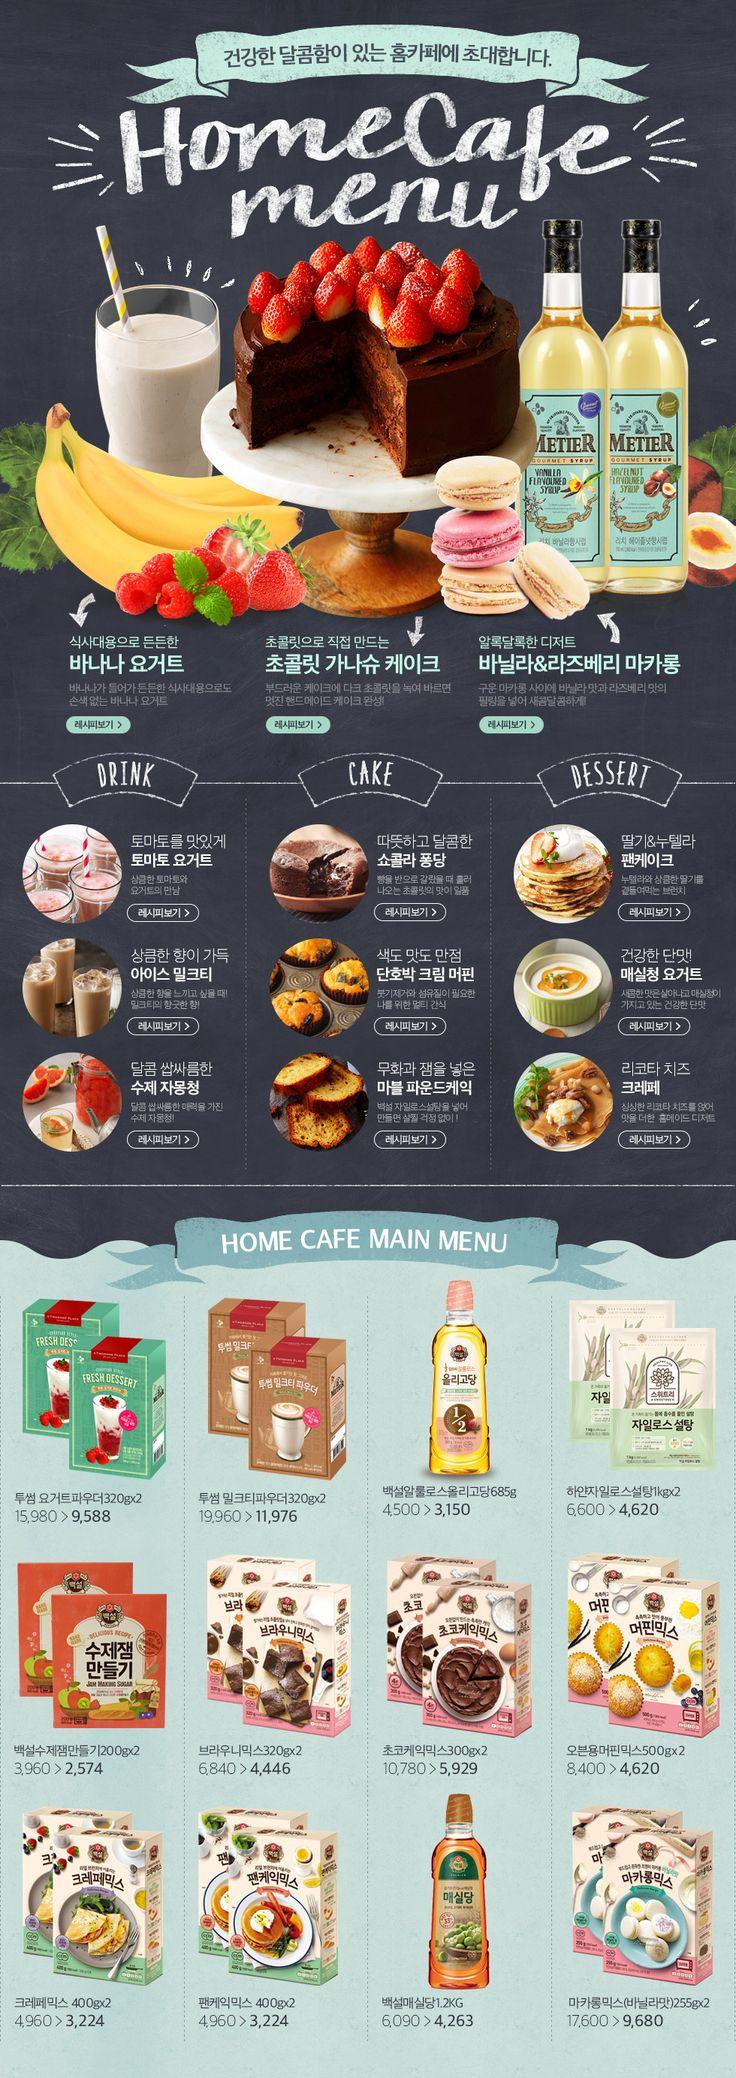 MY LOVELY 홈까페! | 기획전 | CJ제일제당 직영몰, CJ온마트